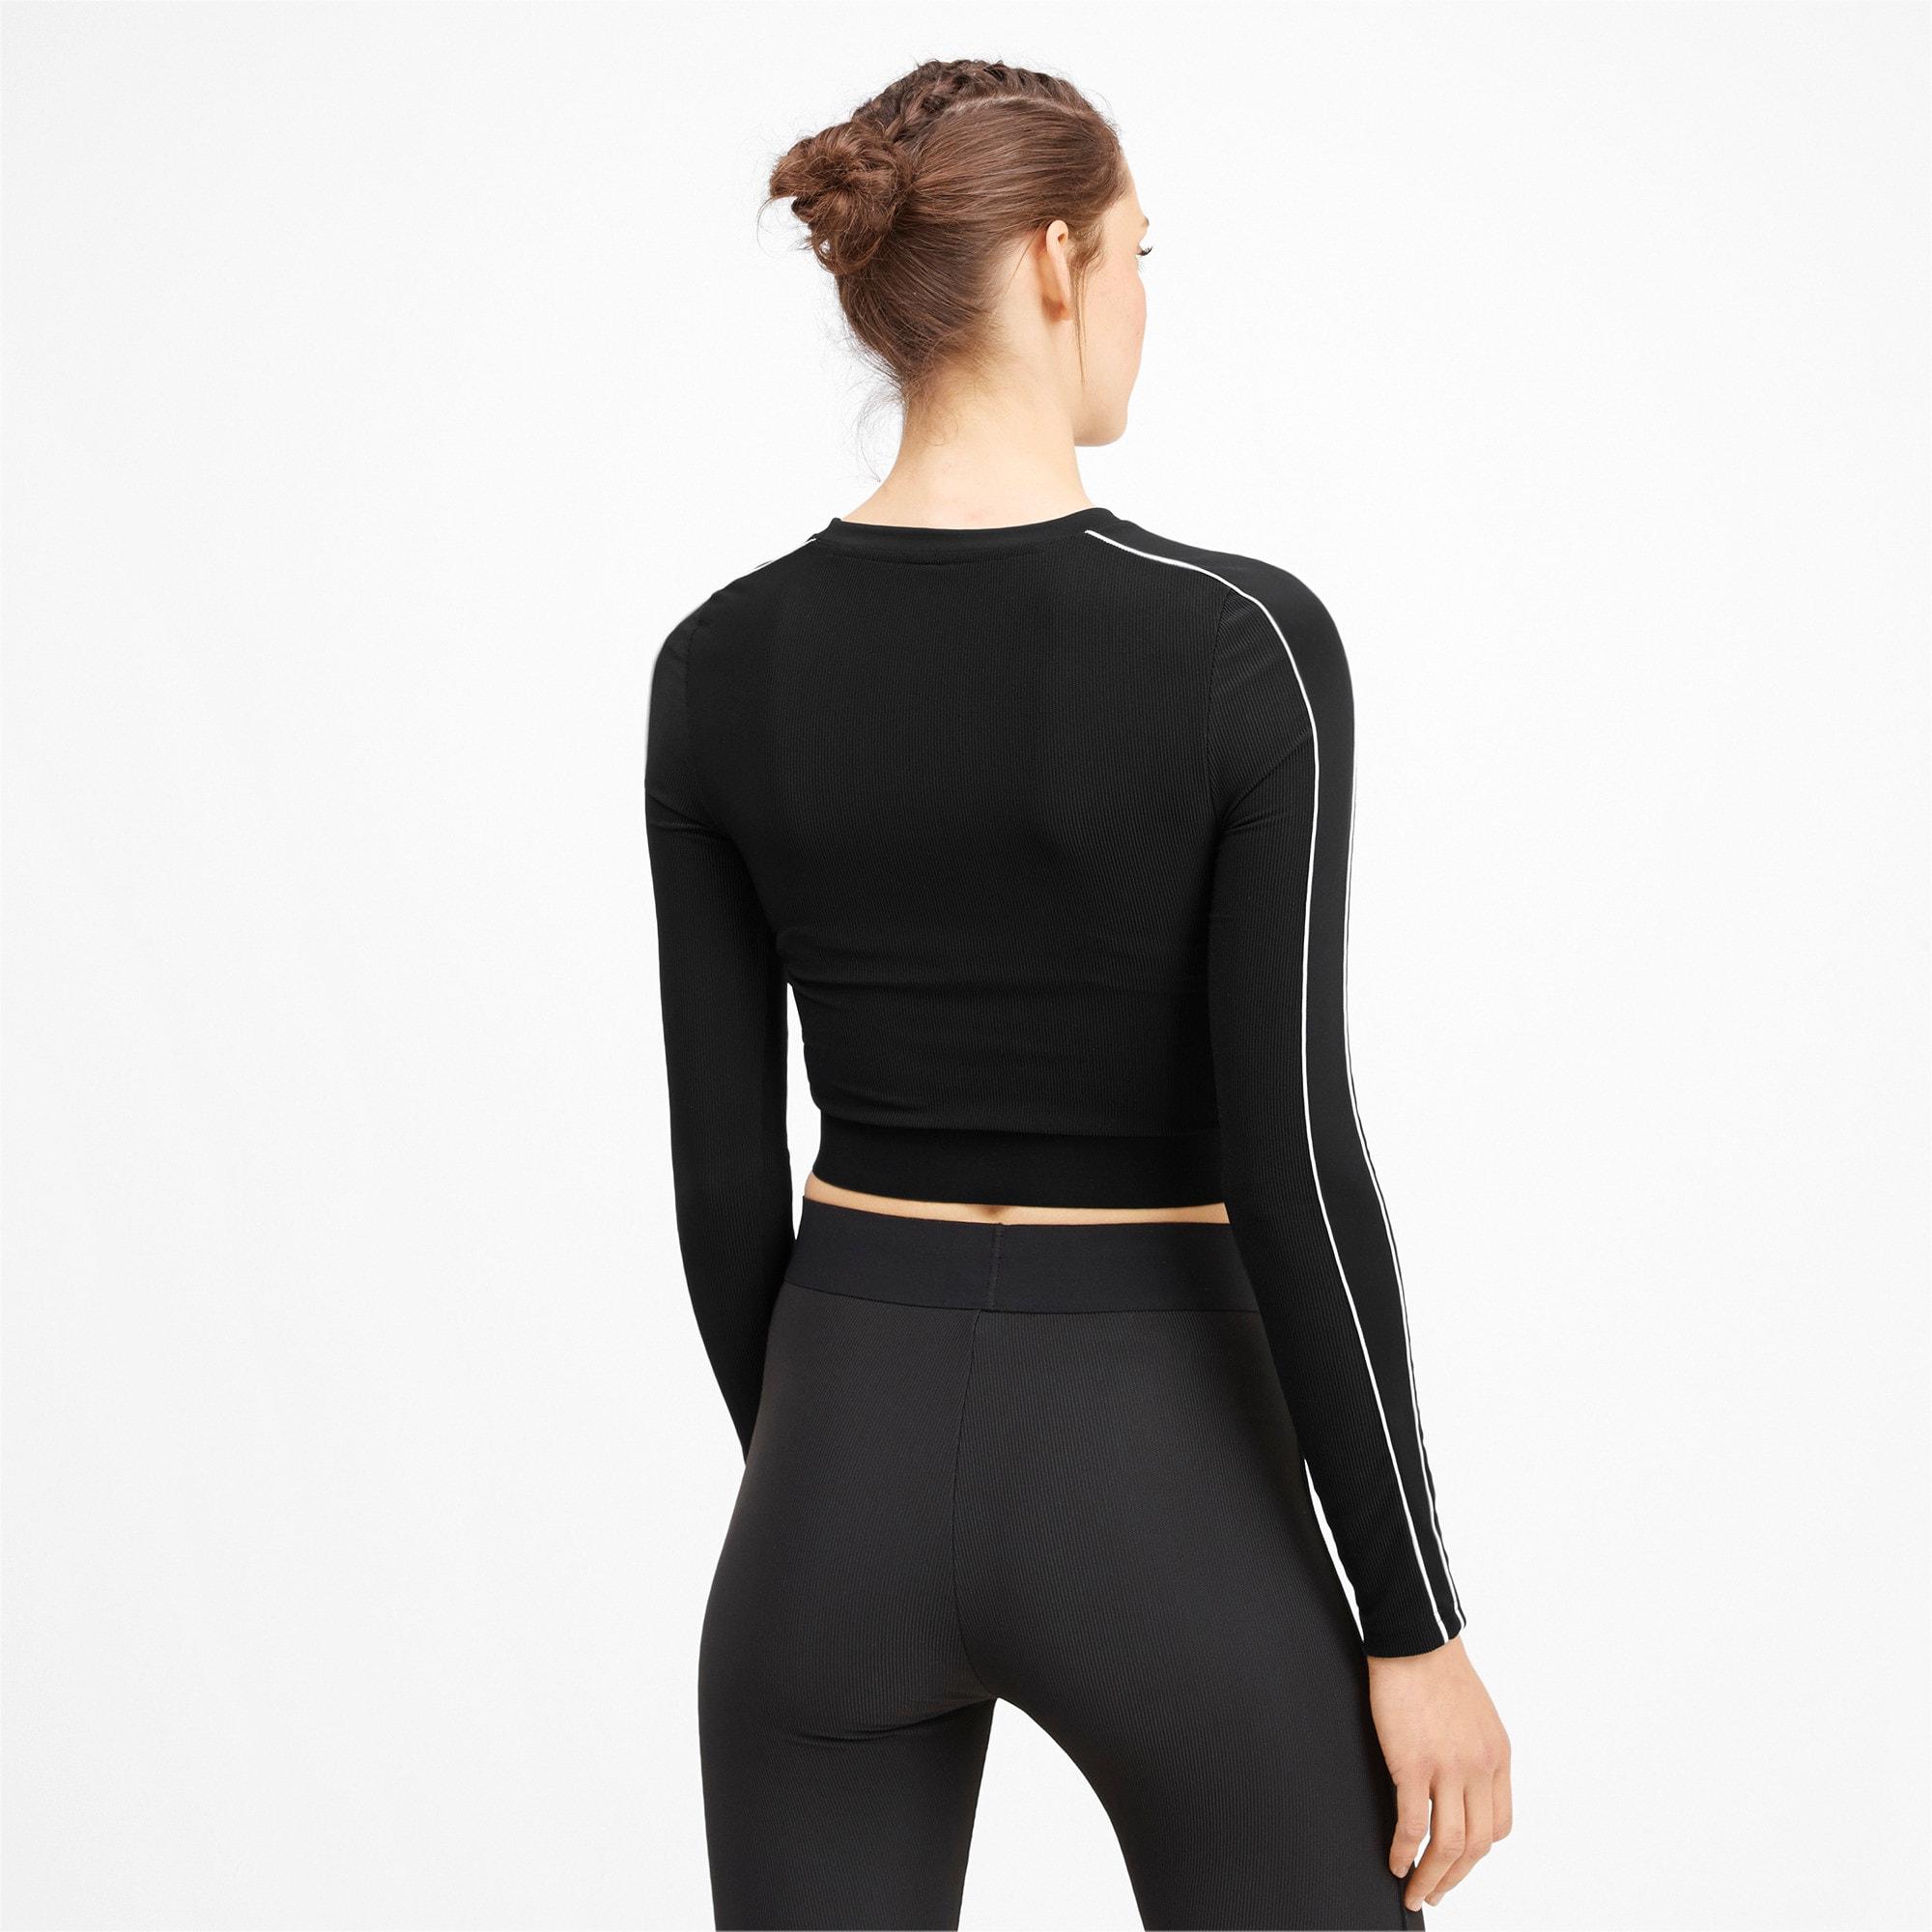 Thumbnail 2 of Classics Rib Cropped Long Sleeve Women's Top, Puma Black, medium